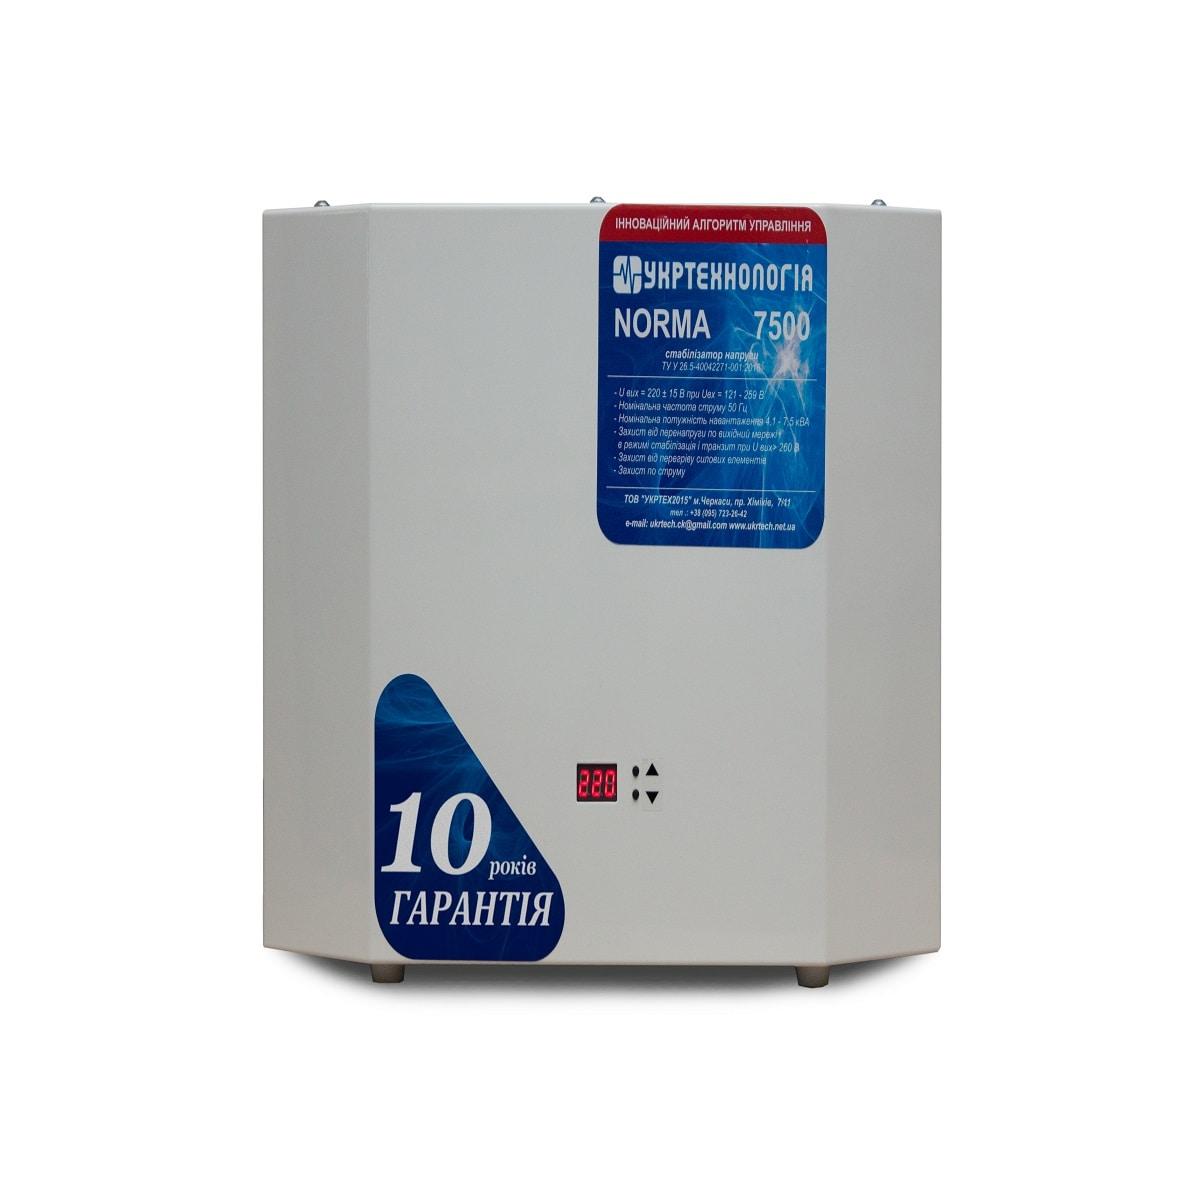 Для дома - Стабилизатор напряжения 7,5 кВт NORMA 000001375 - Фото 1